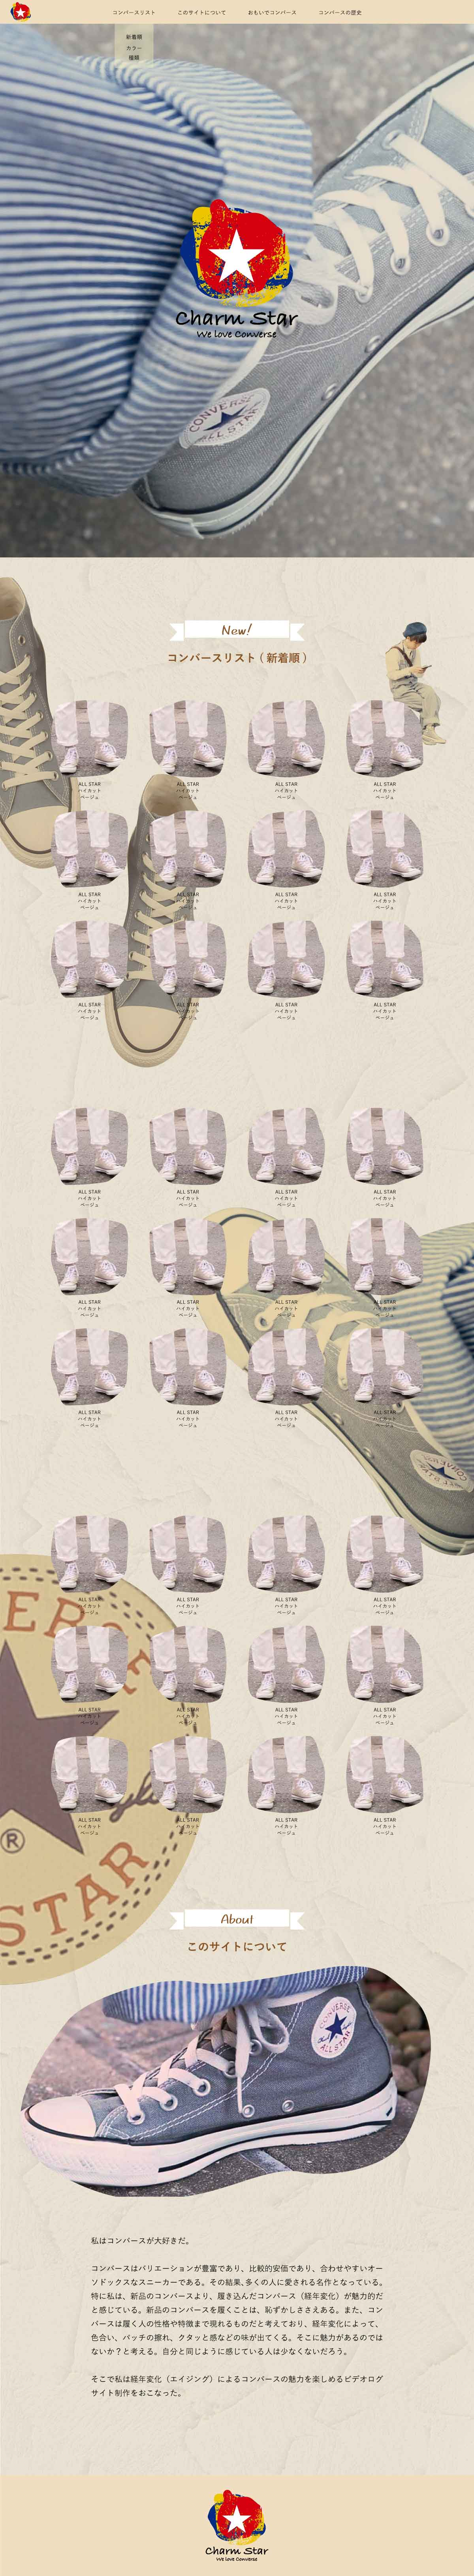 WebImage02.jpg